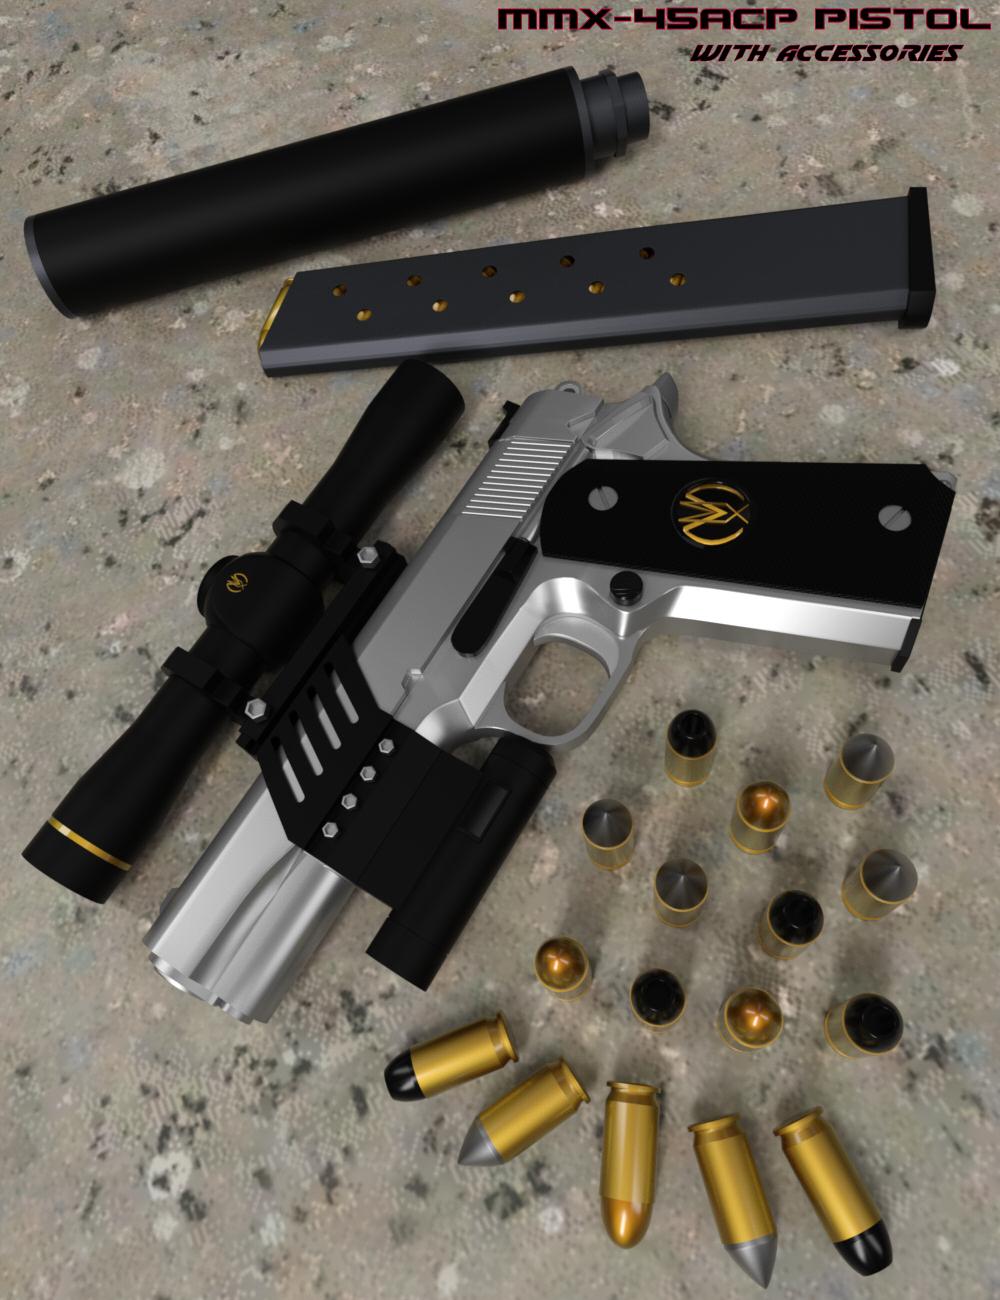 MMX-45ACP Pistol with Accessories by: Mattymanx, 3D Models by Daz 3D